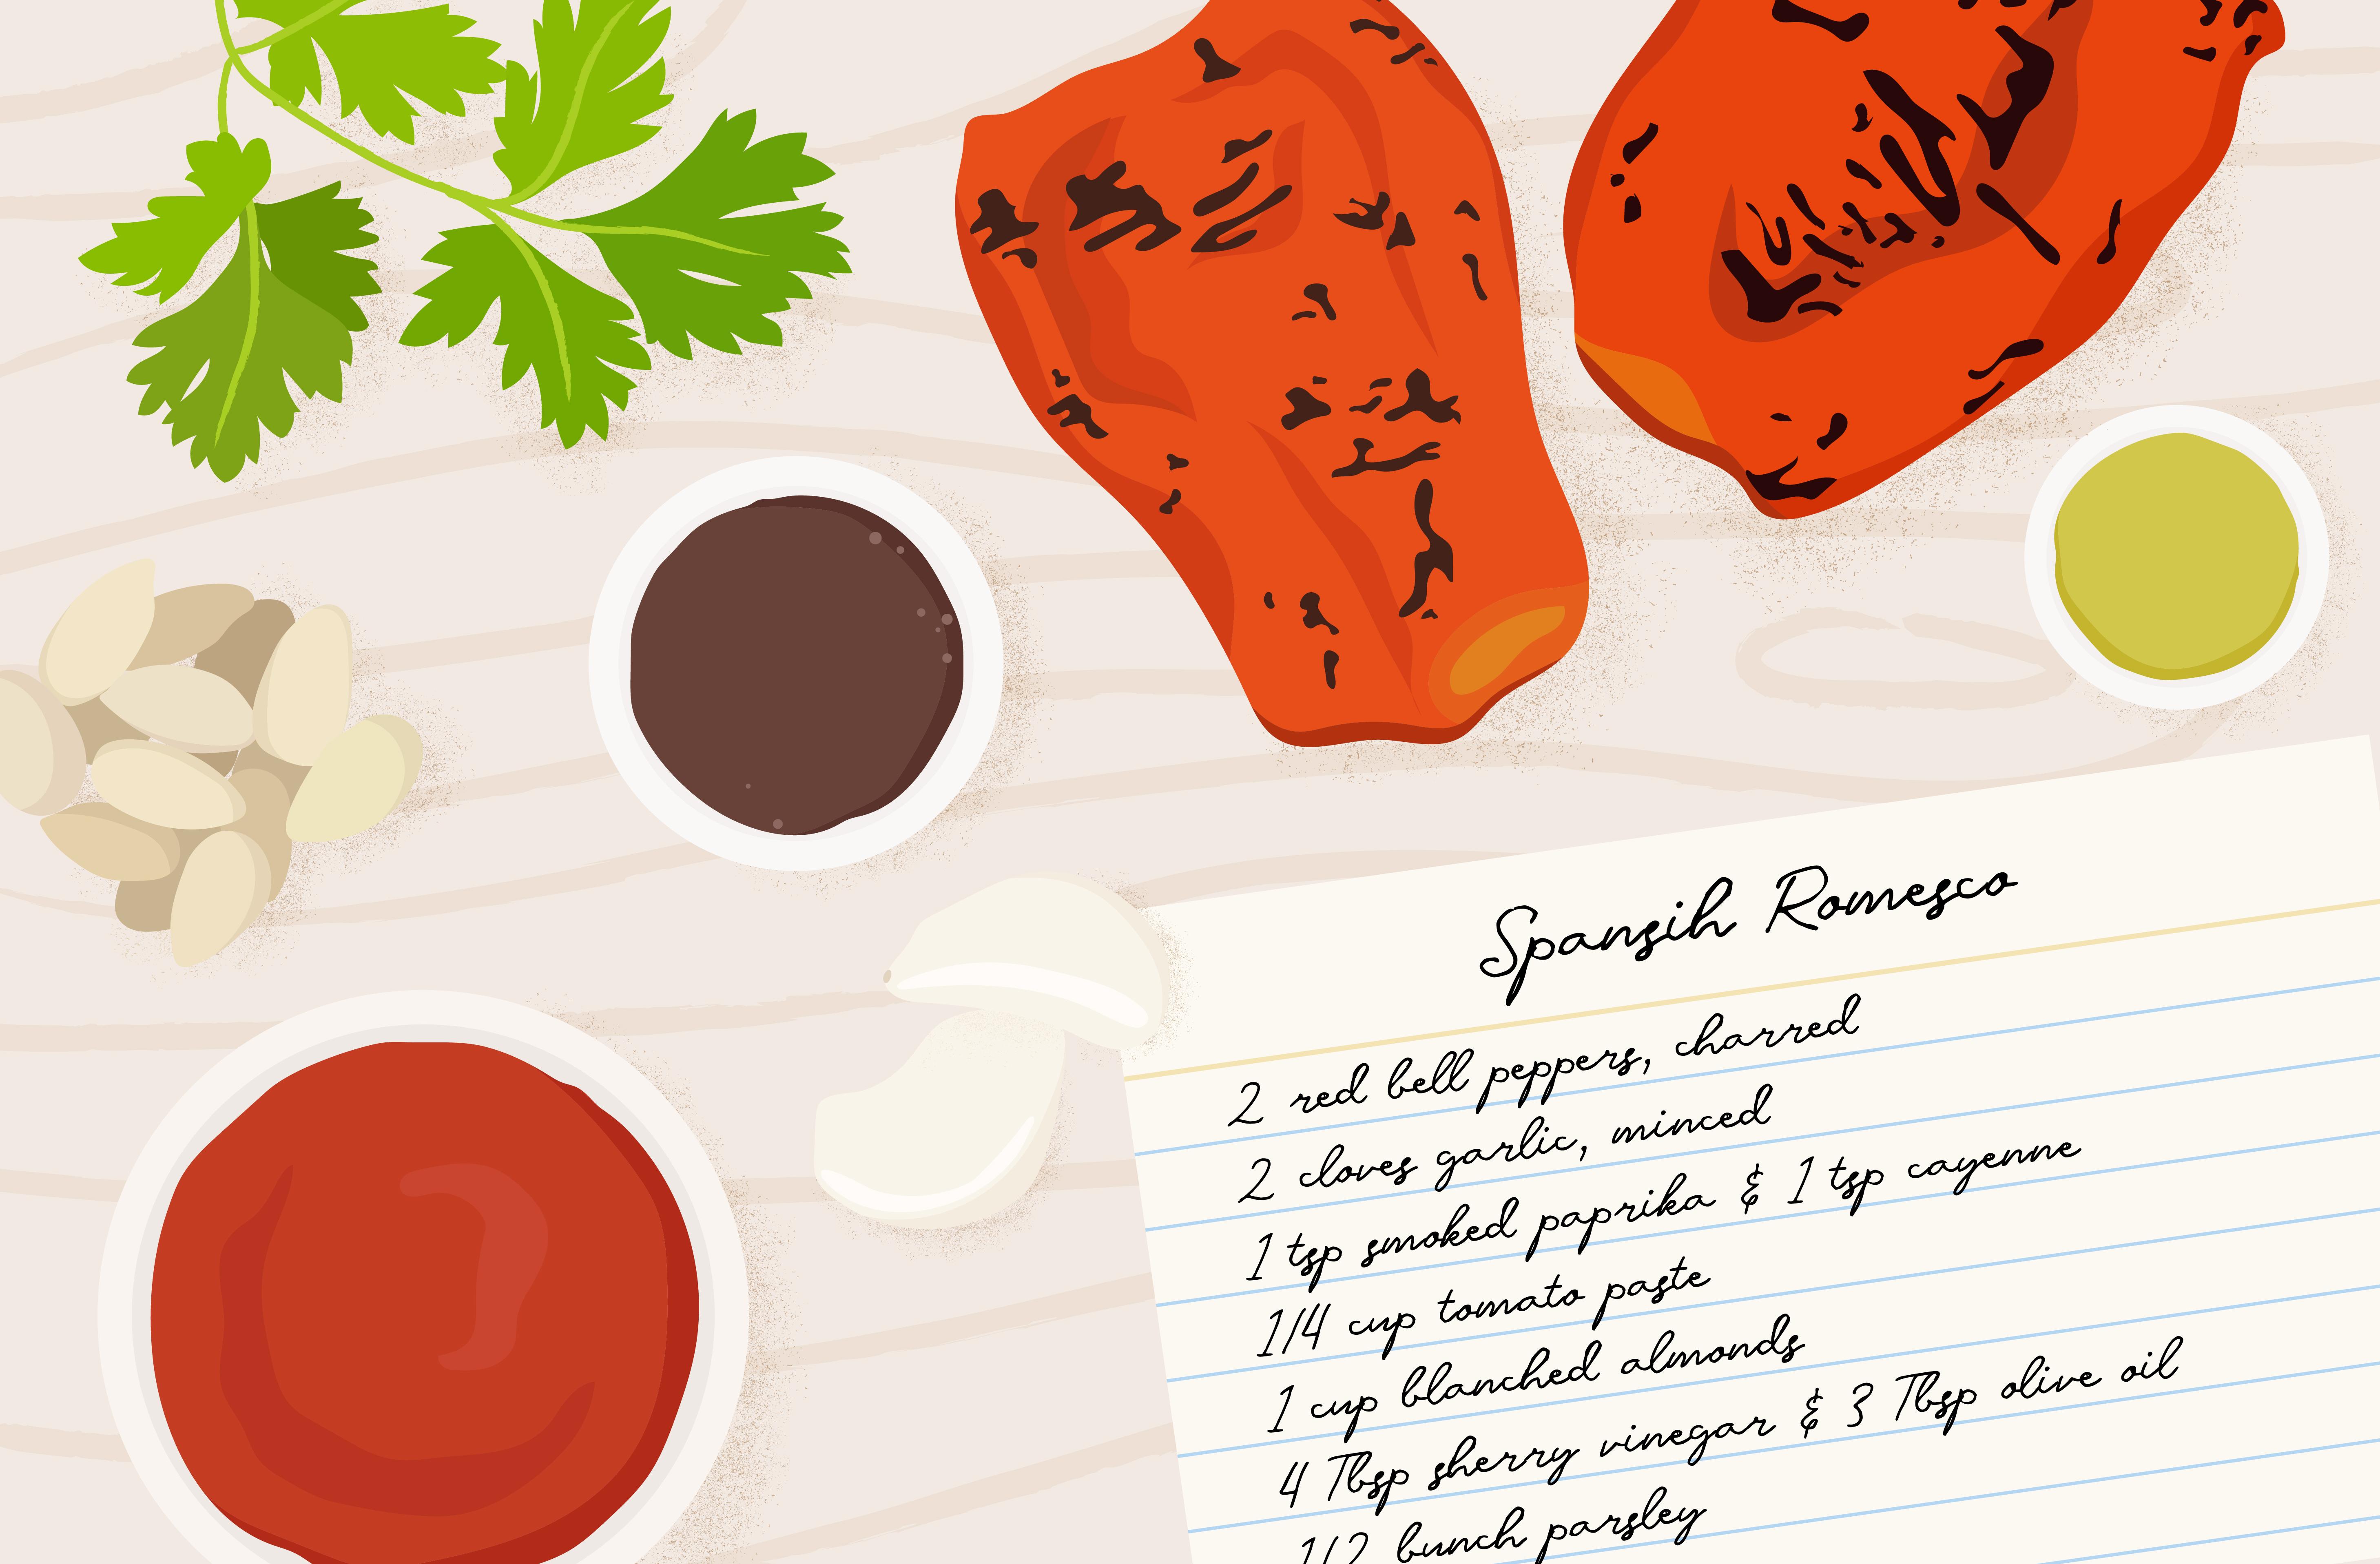 spanish romesco sauce recipe card